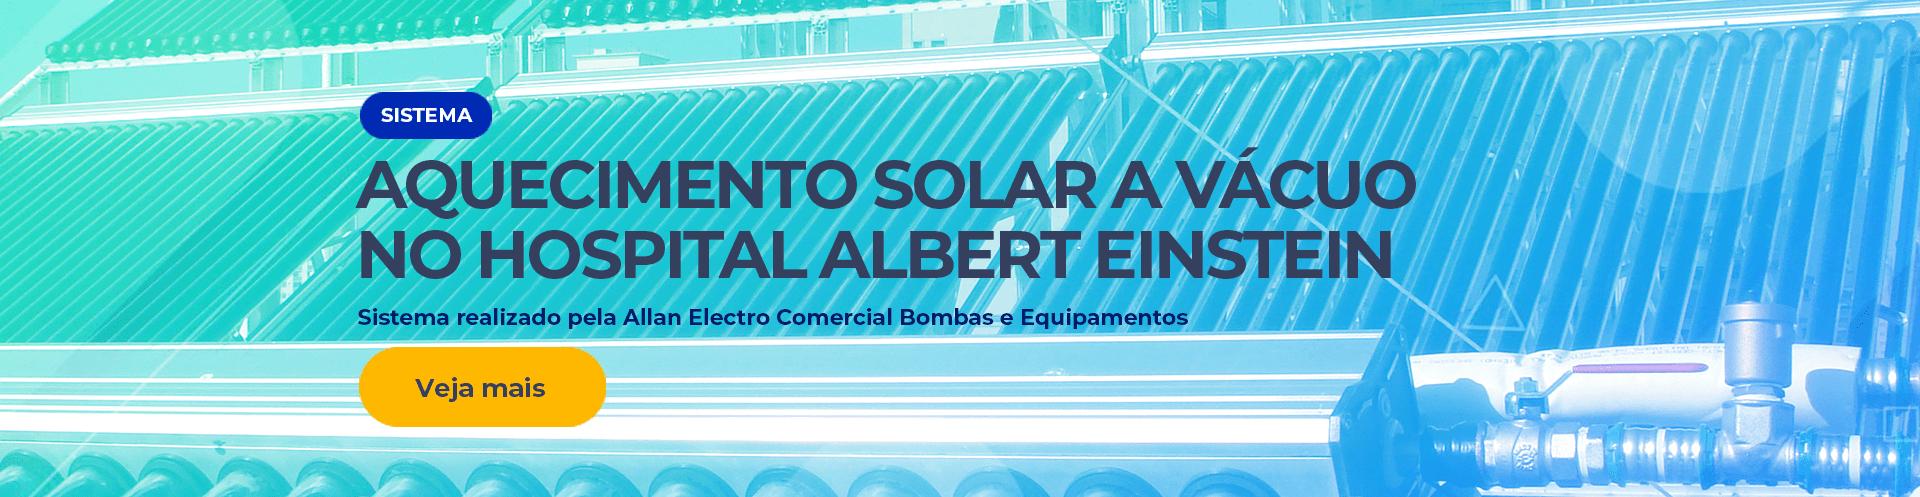 Sistema de Aquecimento Solar a vácuo Hospital Albert Einstein